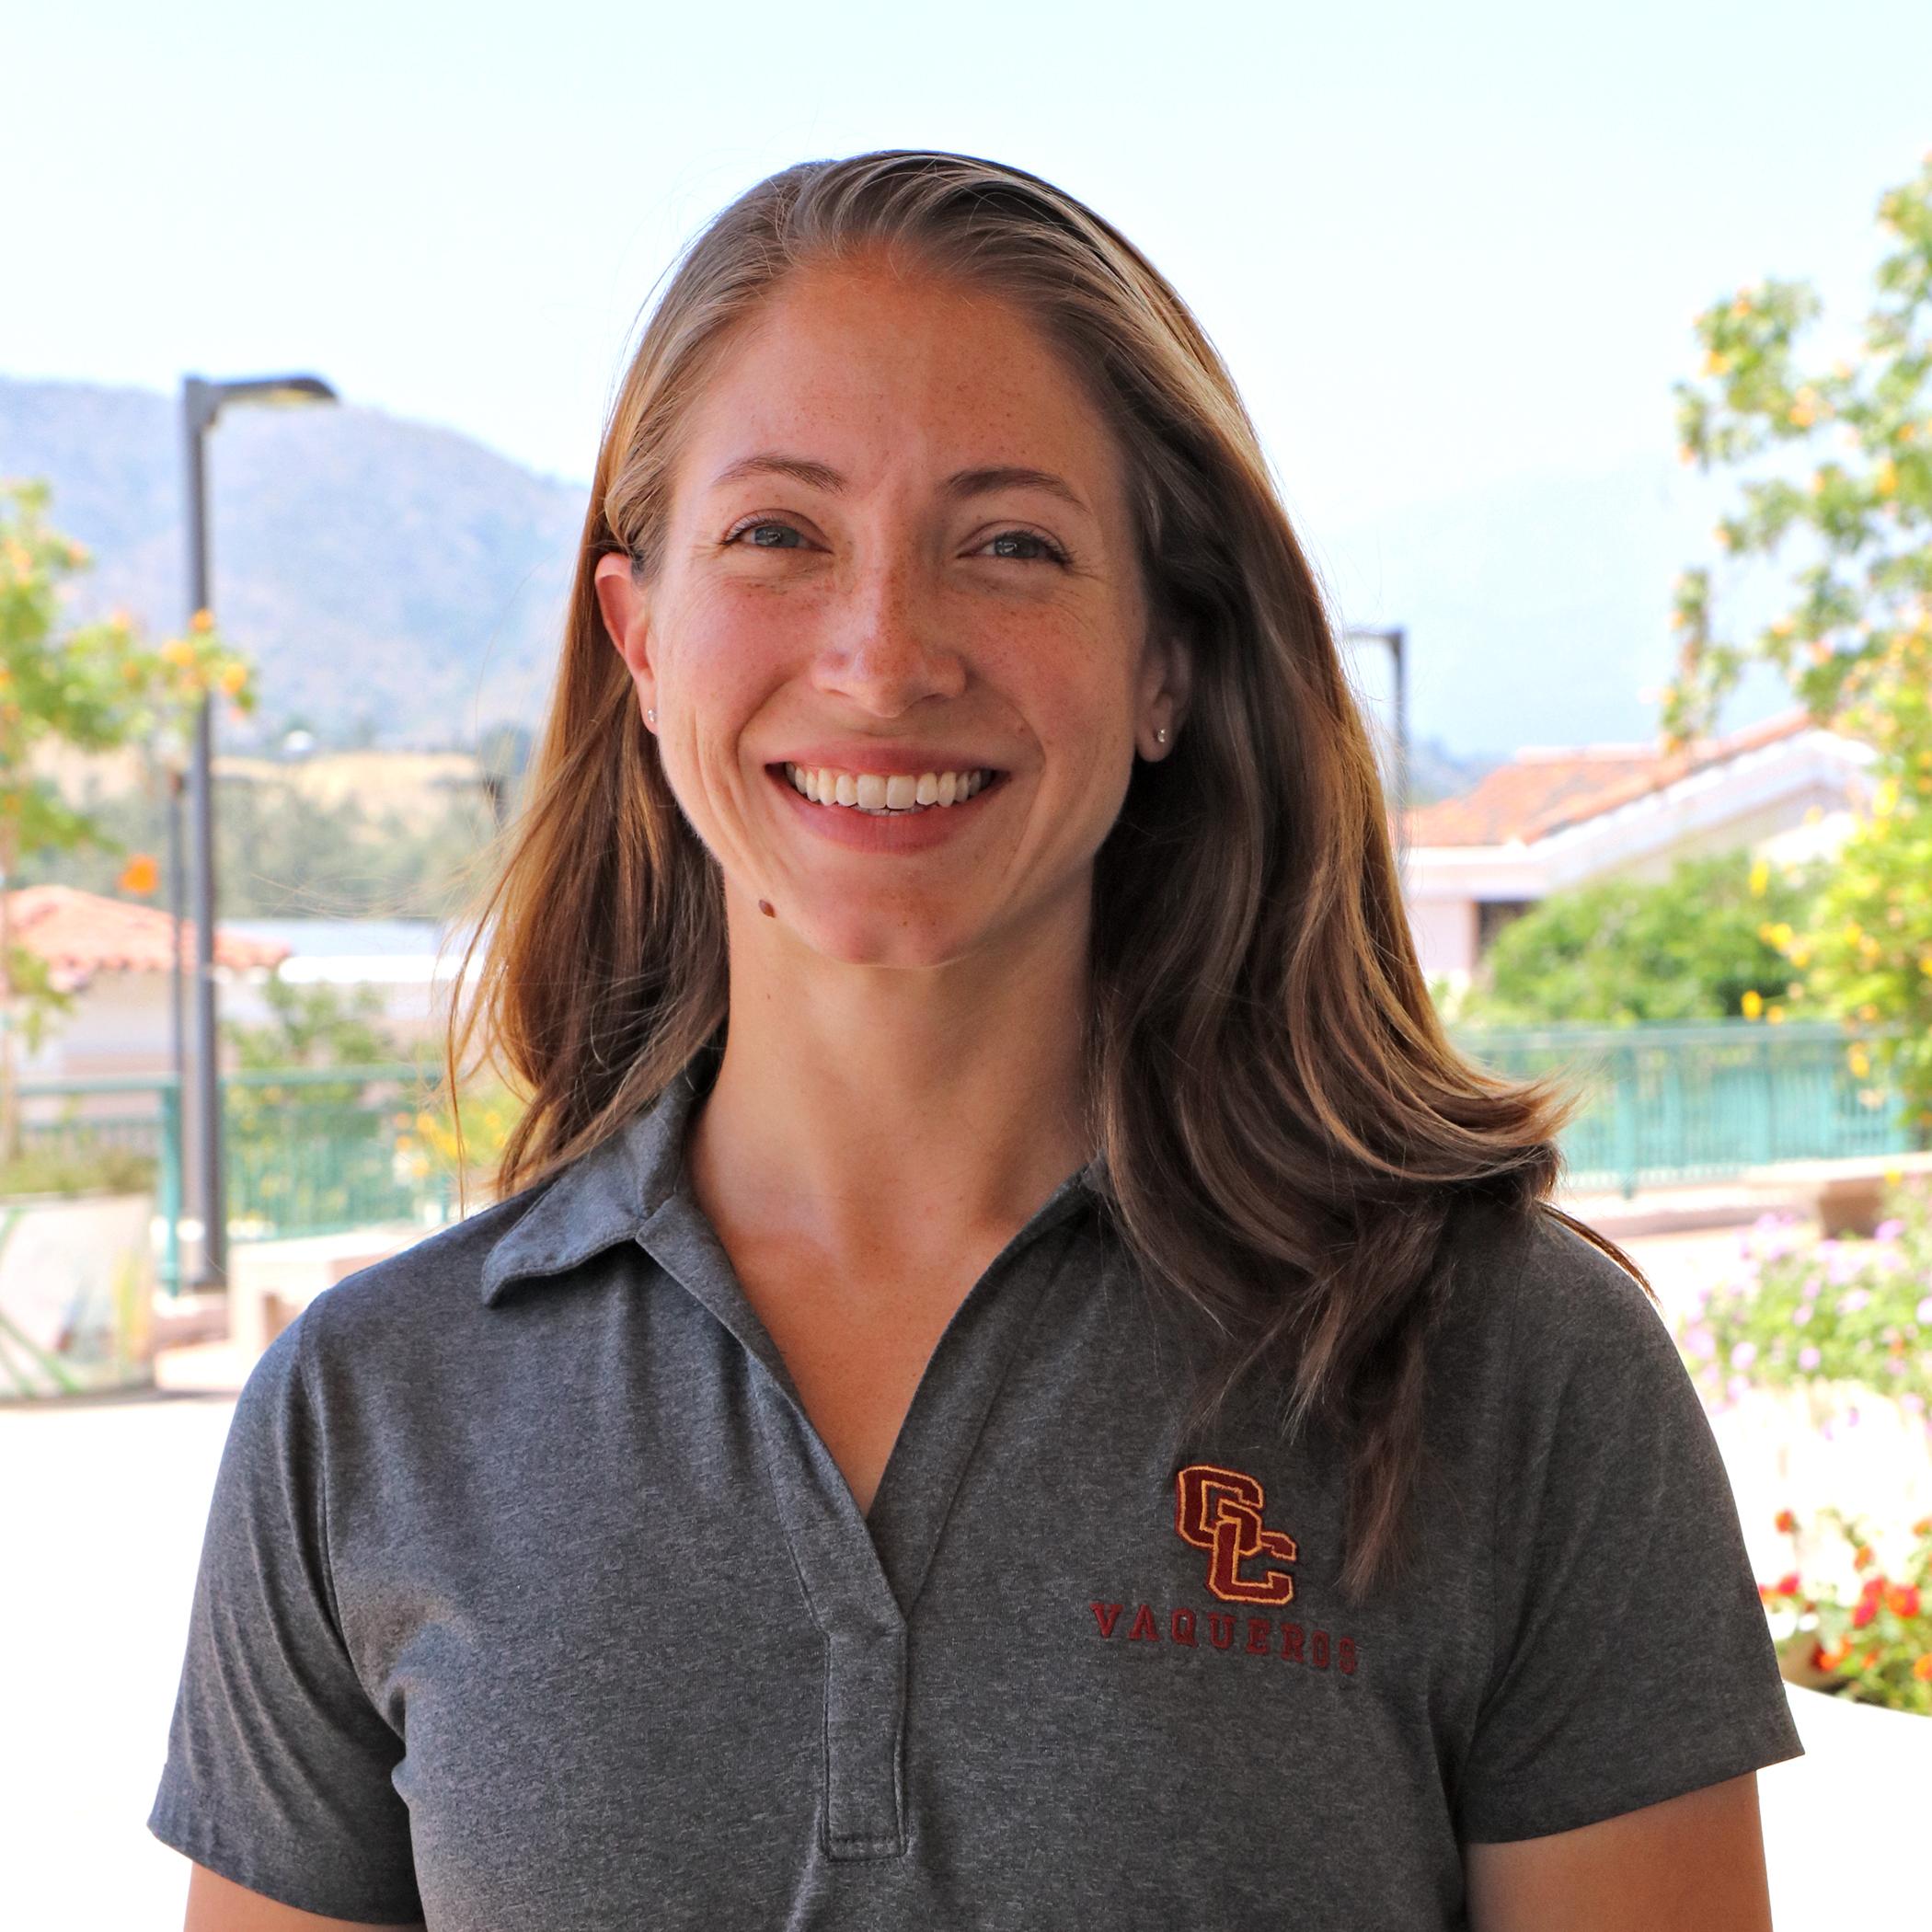 Erin Calderone, Glendale Community College